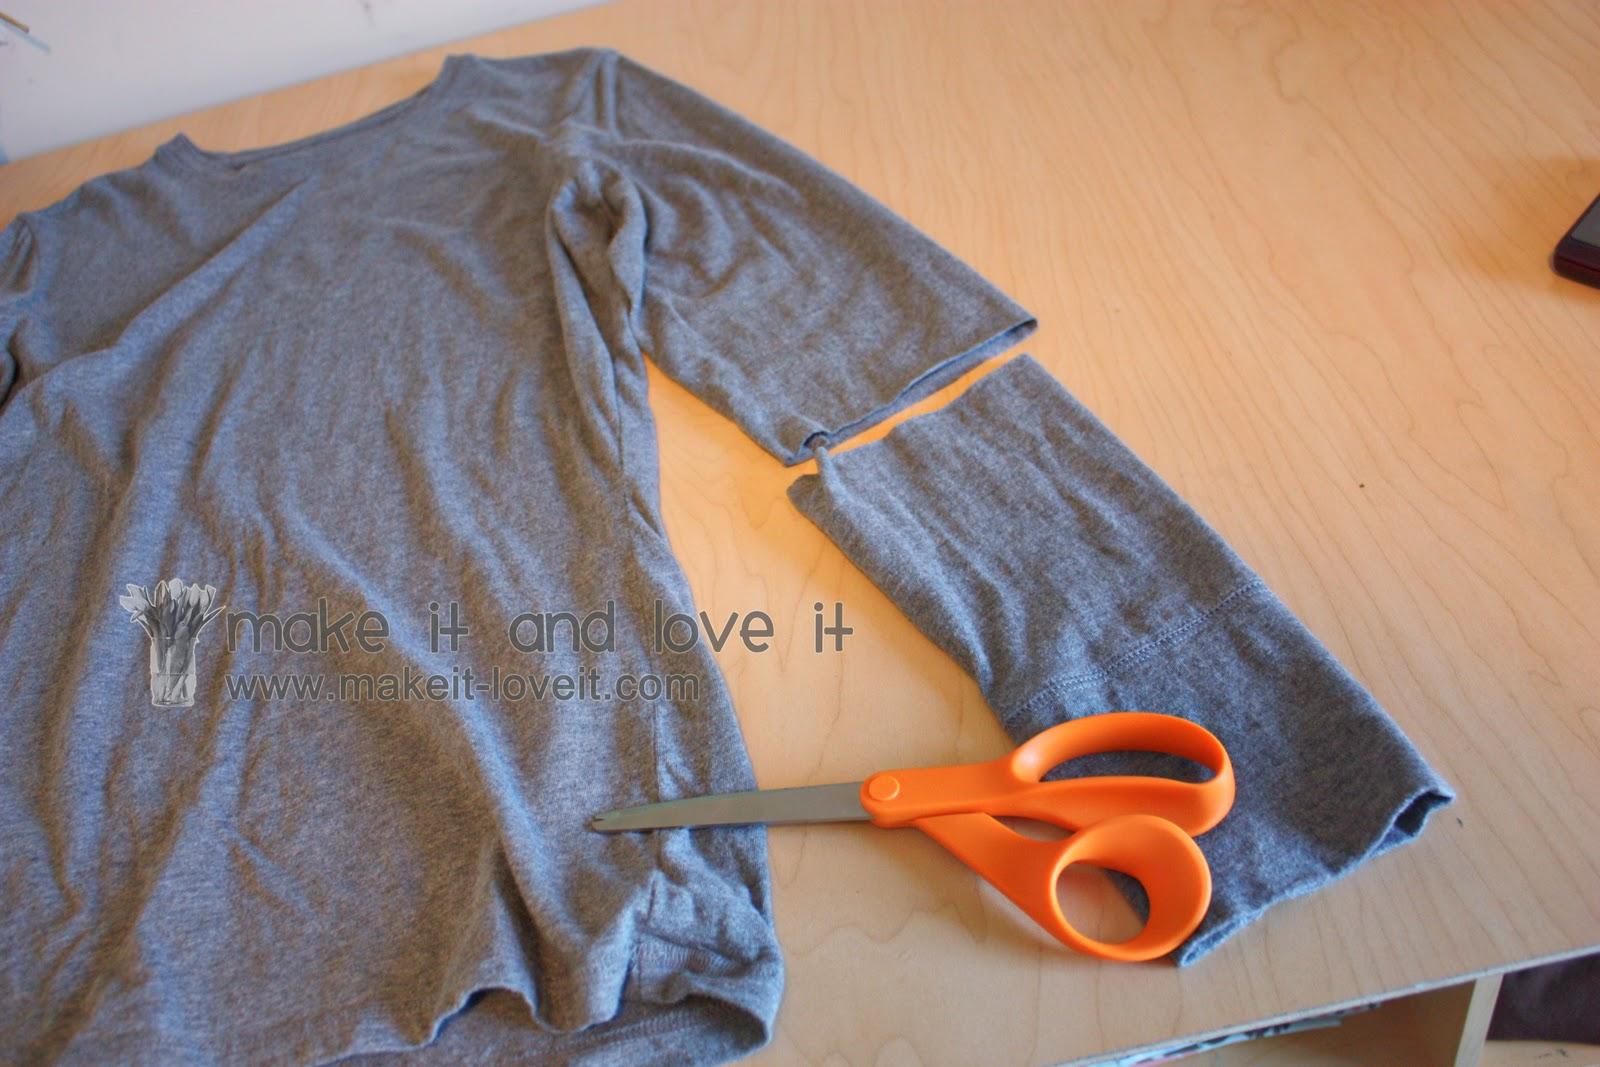 Re-purposing: Women's Long Sleeved Shirt into Short Sleeves ...